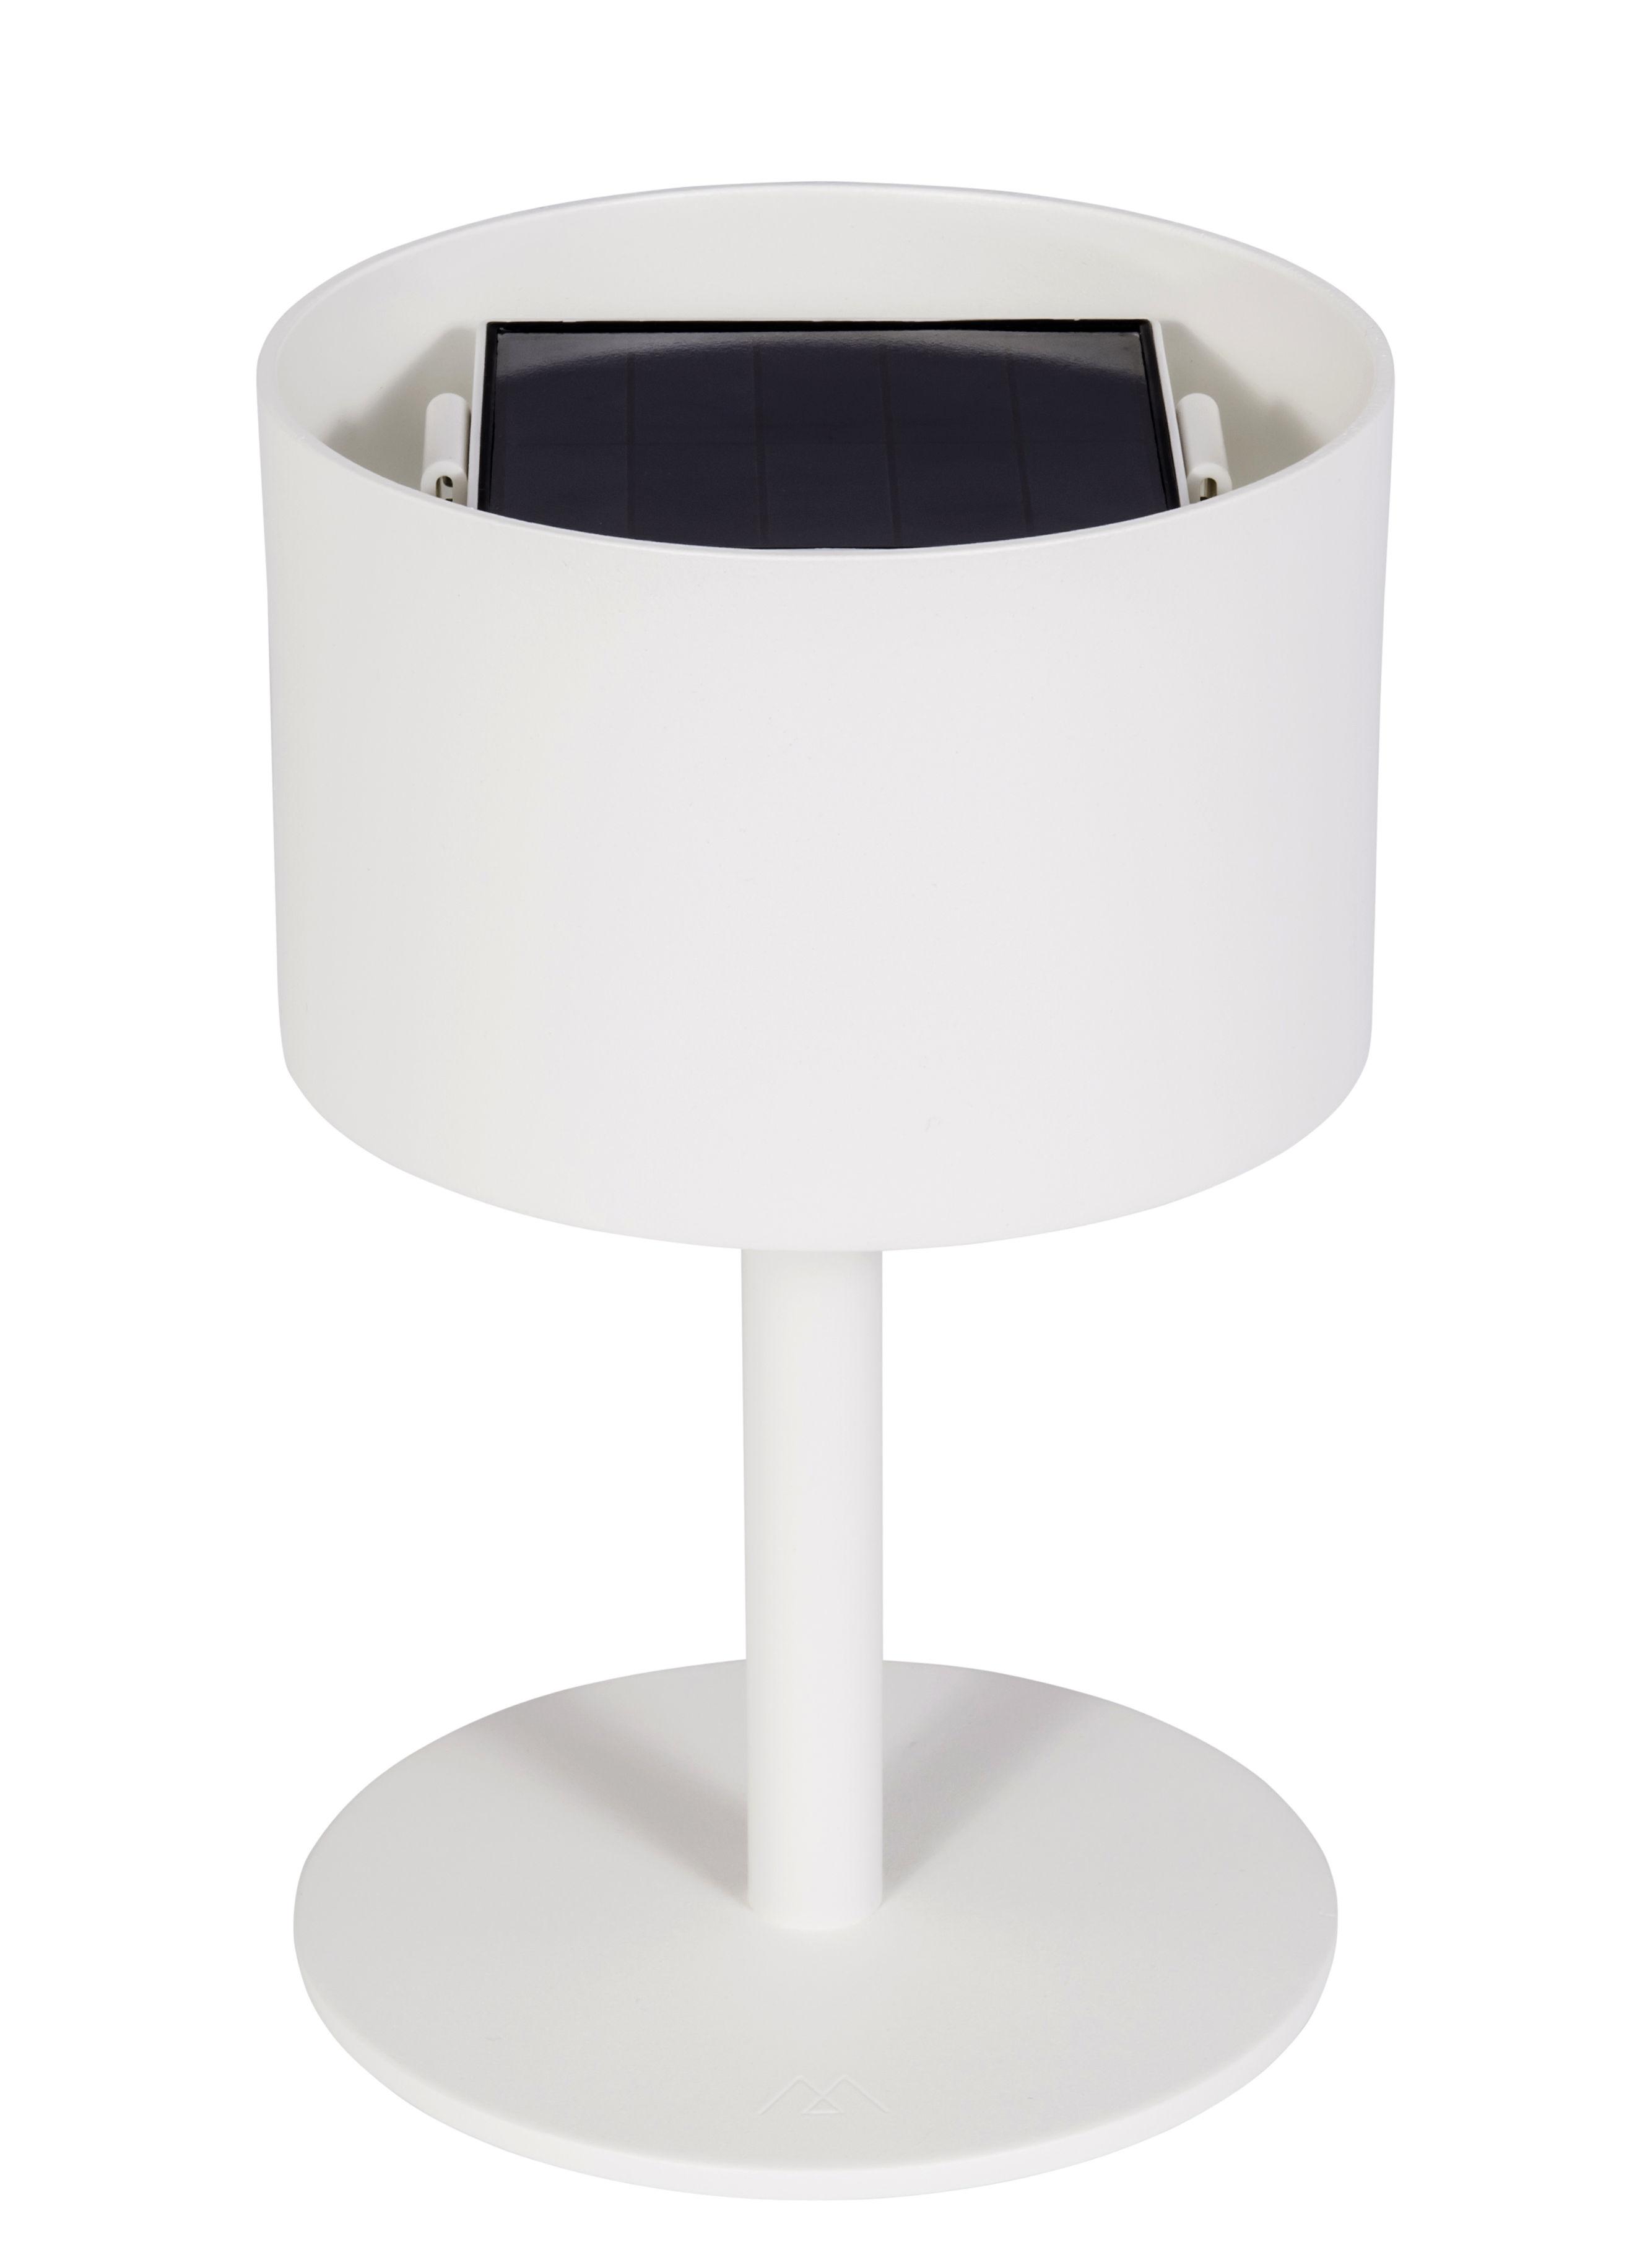 lampe solaire la lampe pose 01 led sans fil blanc maiori. Black Bedroom Furniture Sets. Home Design Ideas